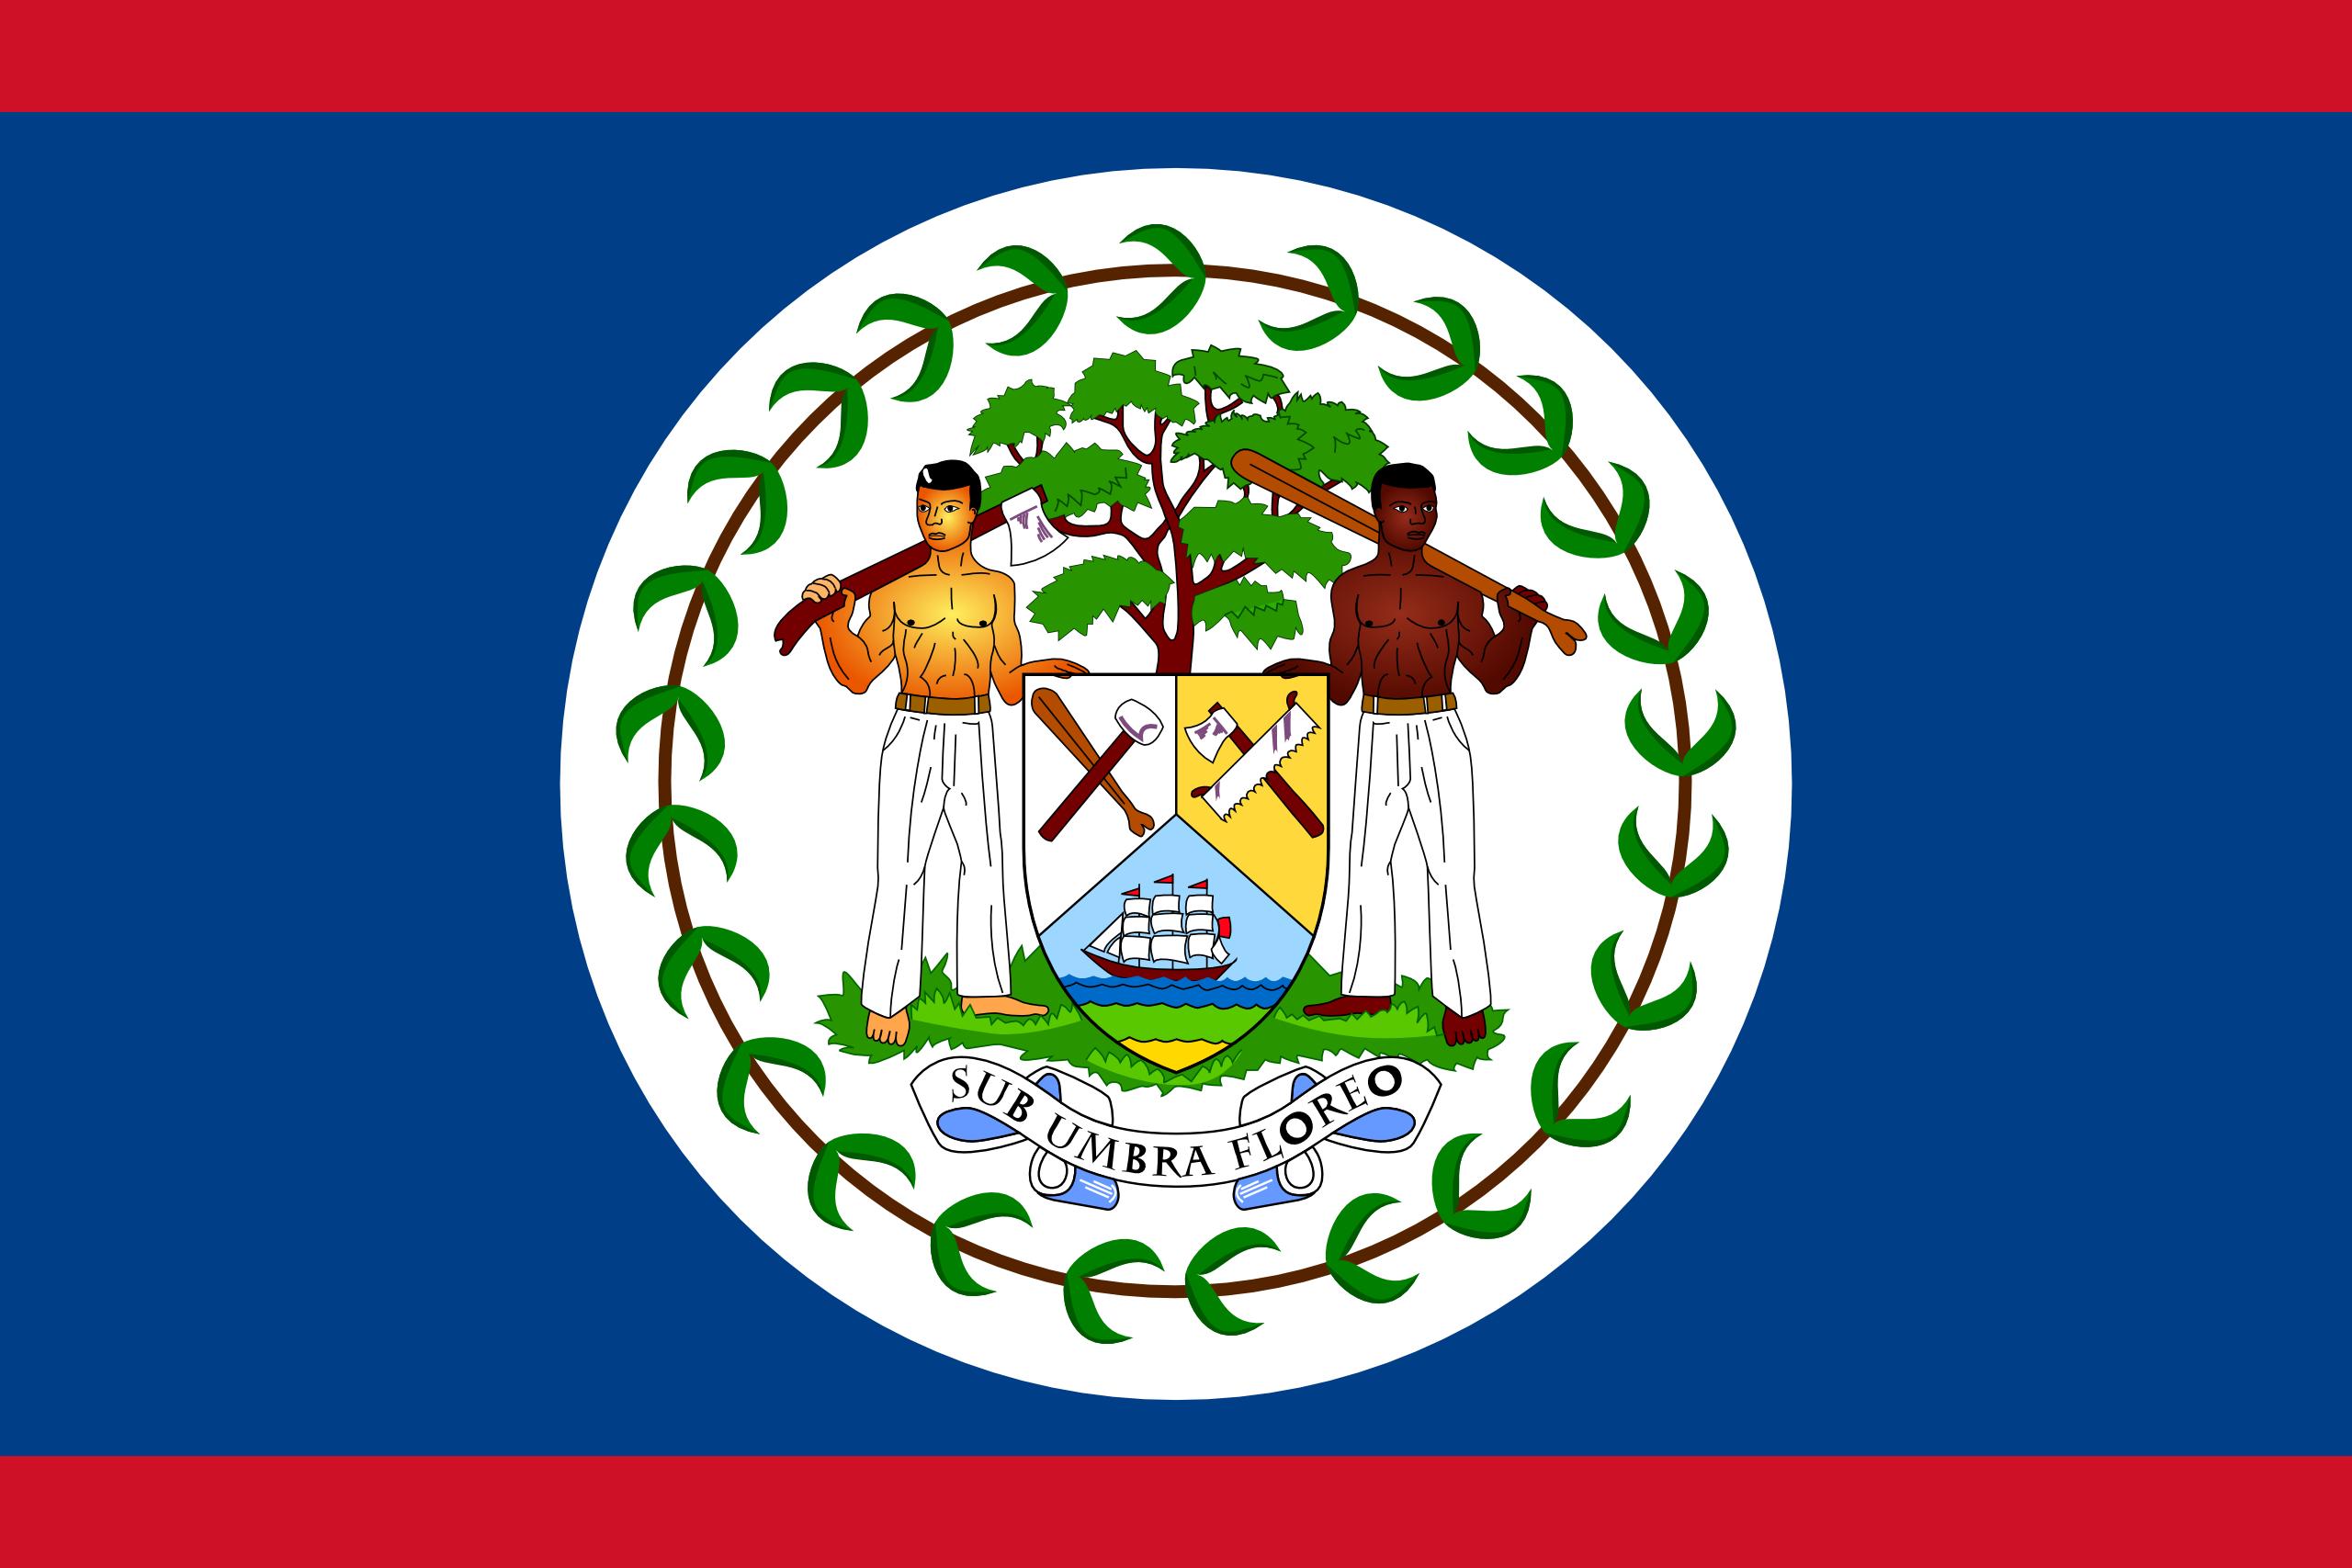 Belize, país, Brasão de armas, logotipo, símbolo - Papéis de parede HD - Professor-falken.com